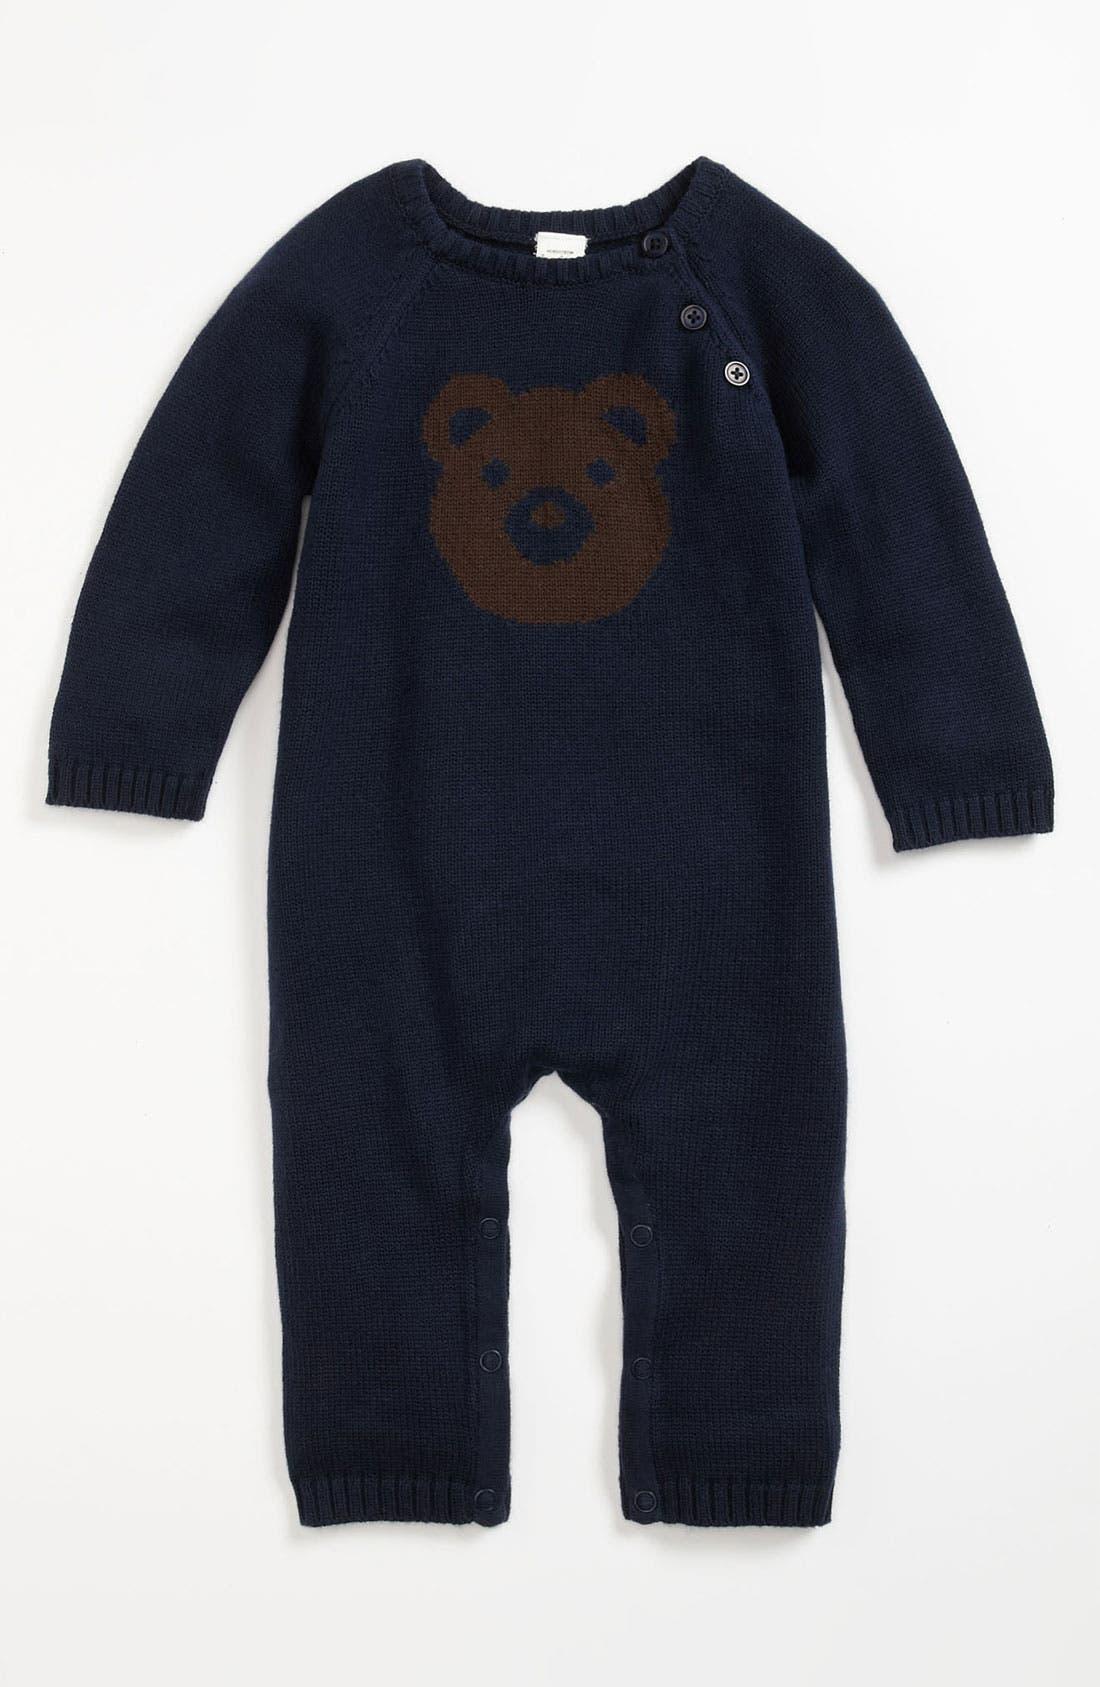 Alternate Image 1 Selected - Nordstrom Baby Knit Romper (Infant)